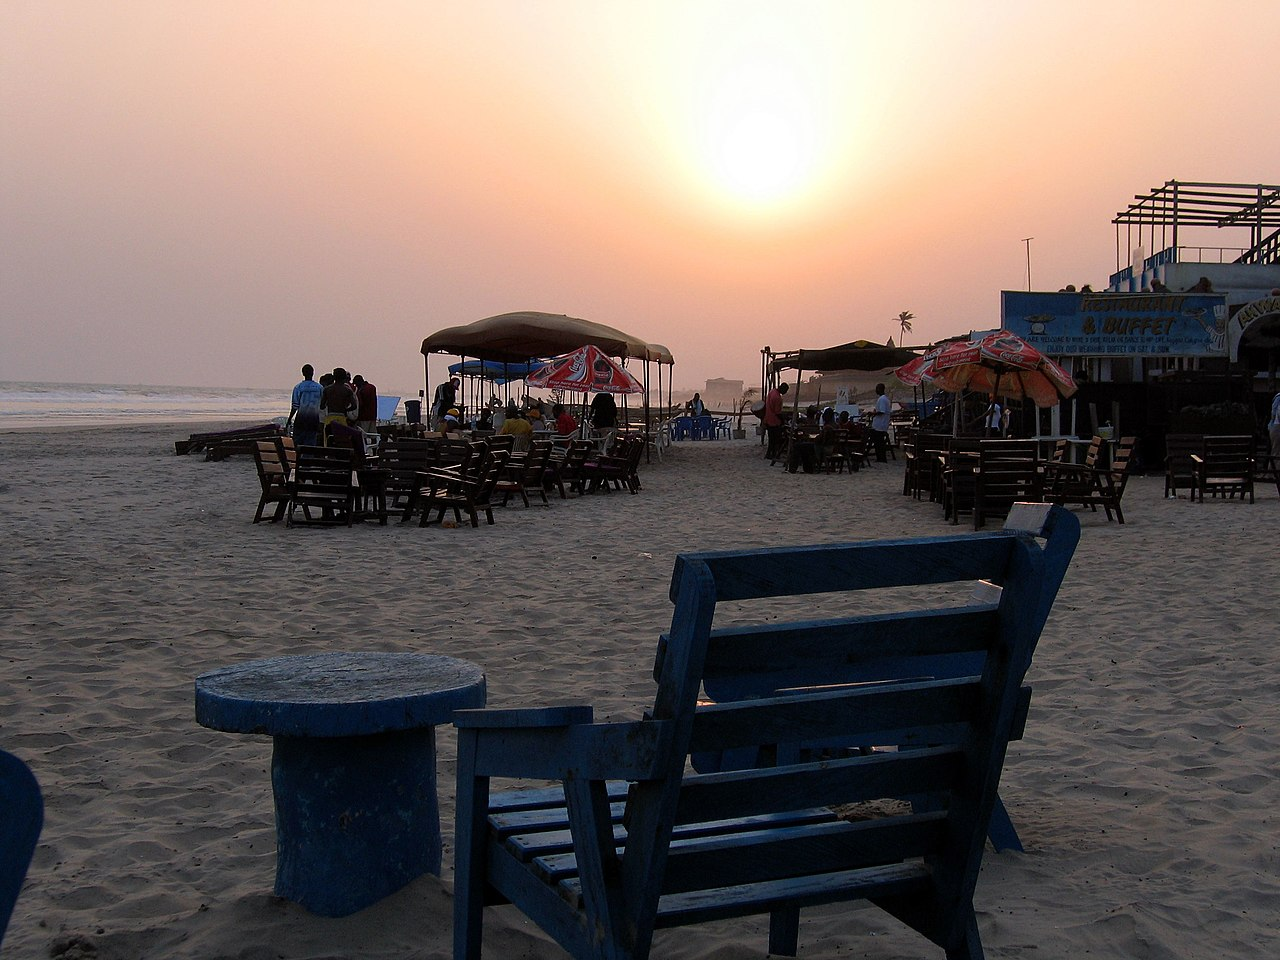 Labadi Pleasure Beach - Top Things to Do in Accra